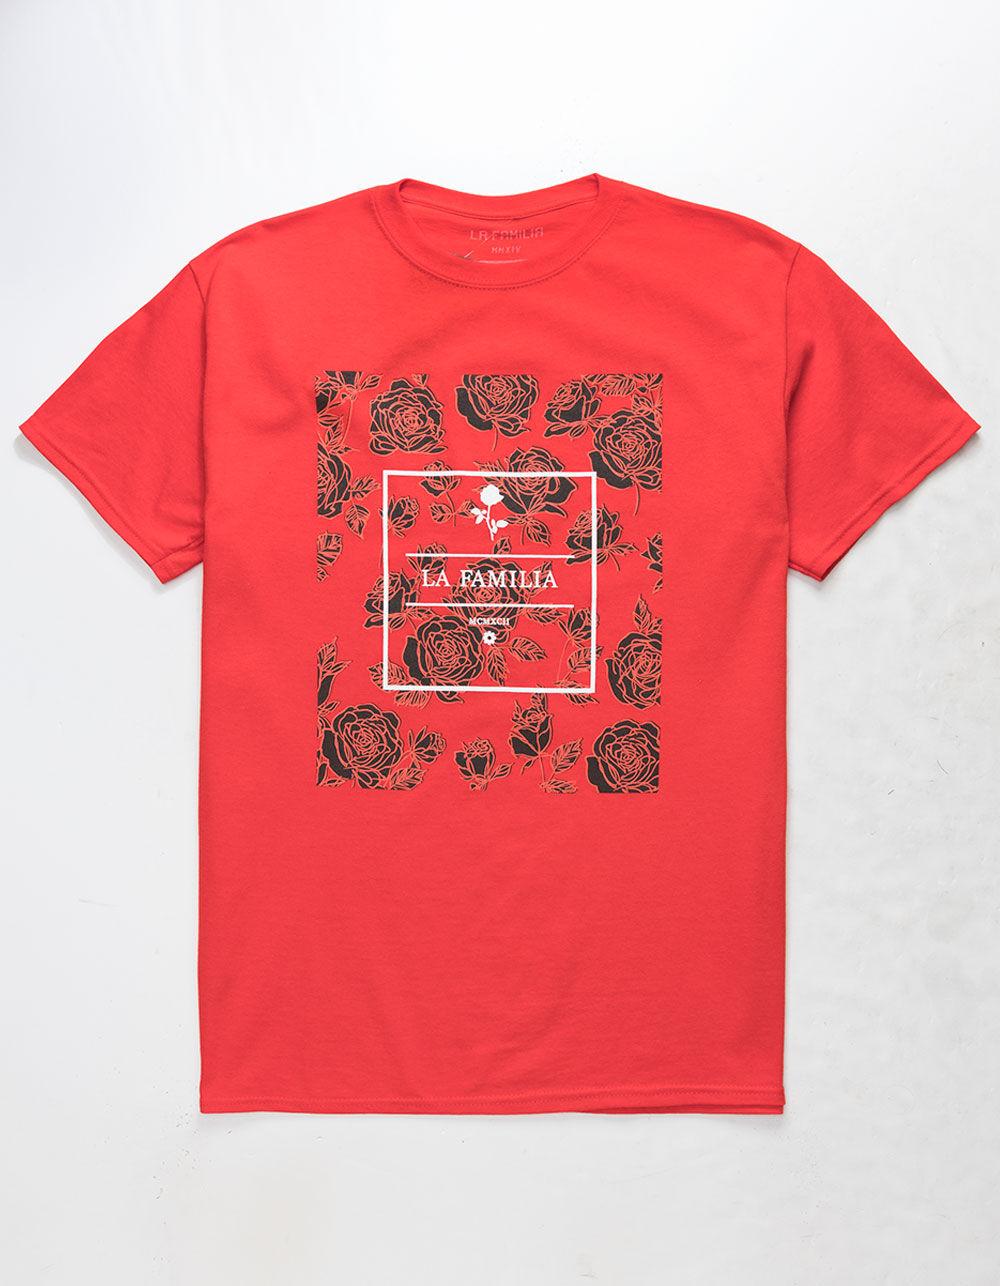 LA FAMILIA Core Rose Red T-Shirt